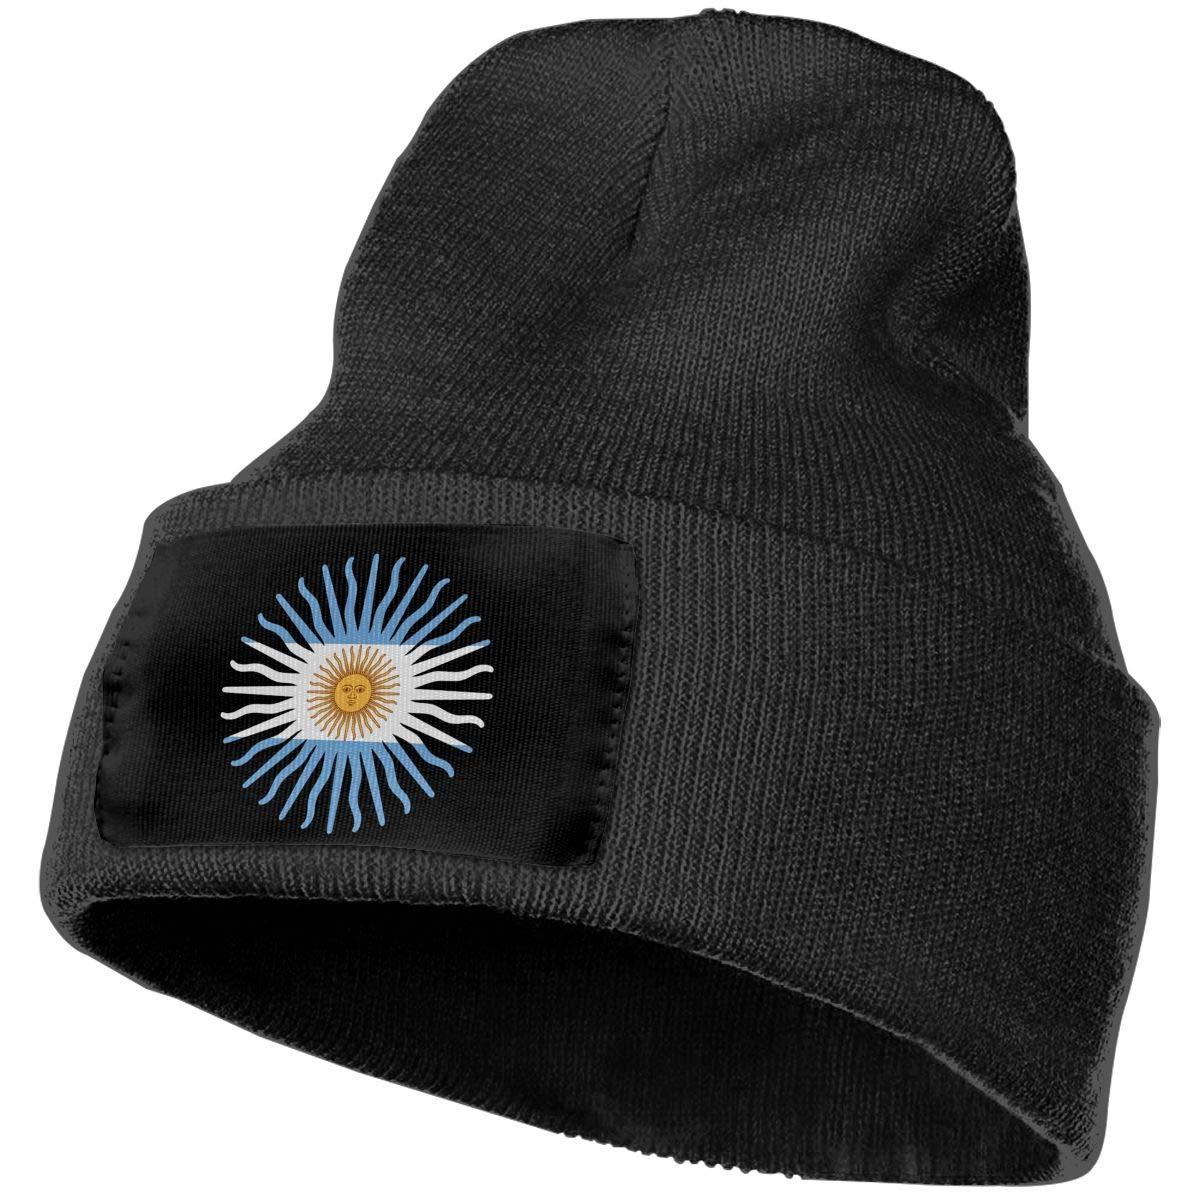 COLLJL-8 Men /& Women Argentina Flag Outdoor Warm Knit Beanies Hat Soft Winter Knit Caps